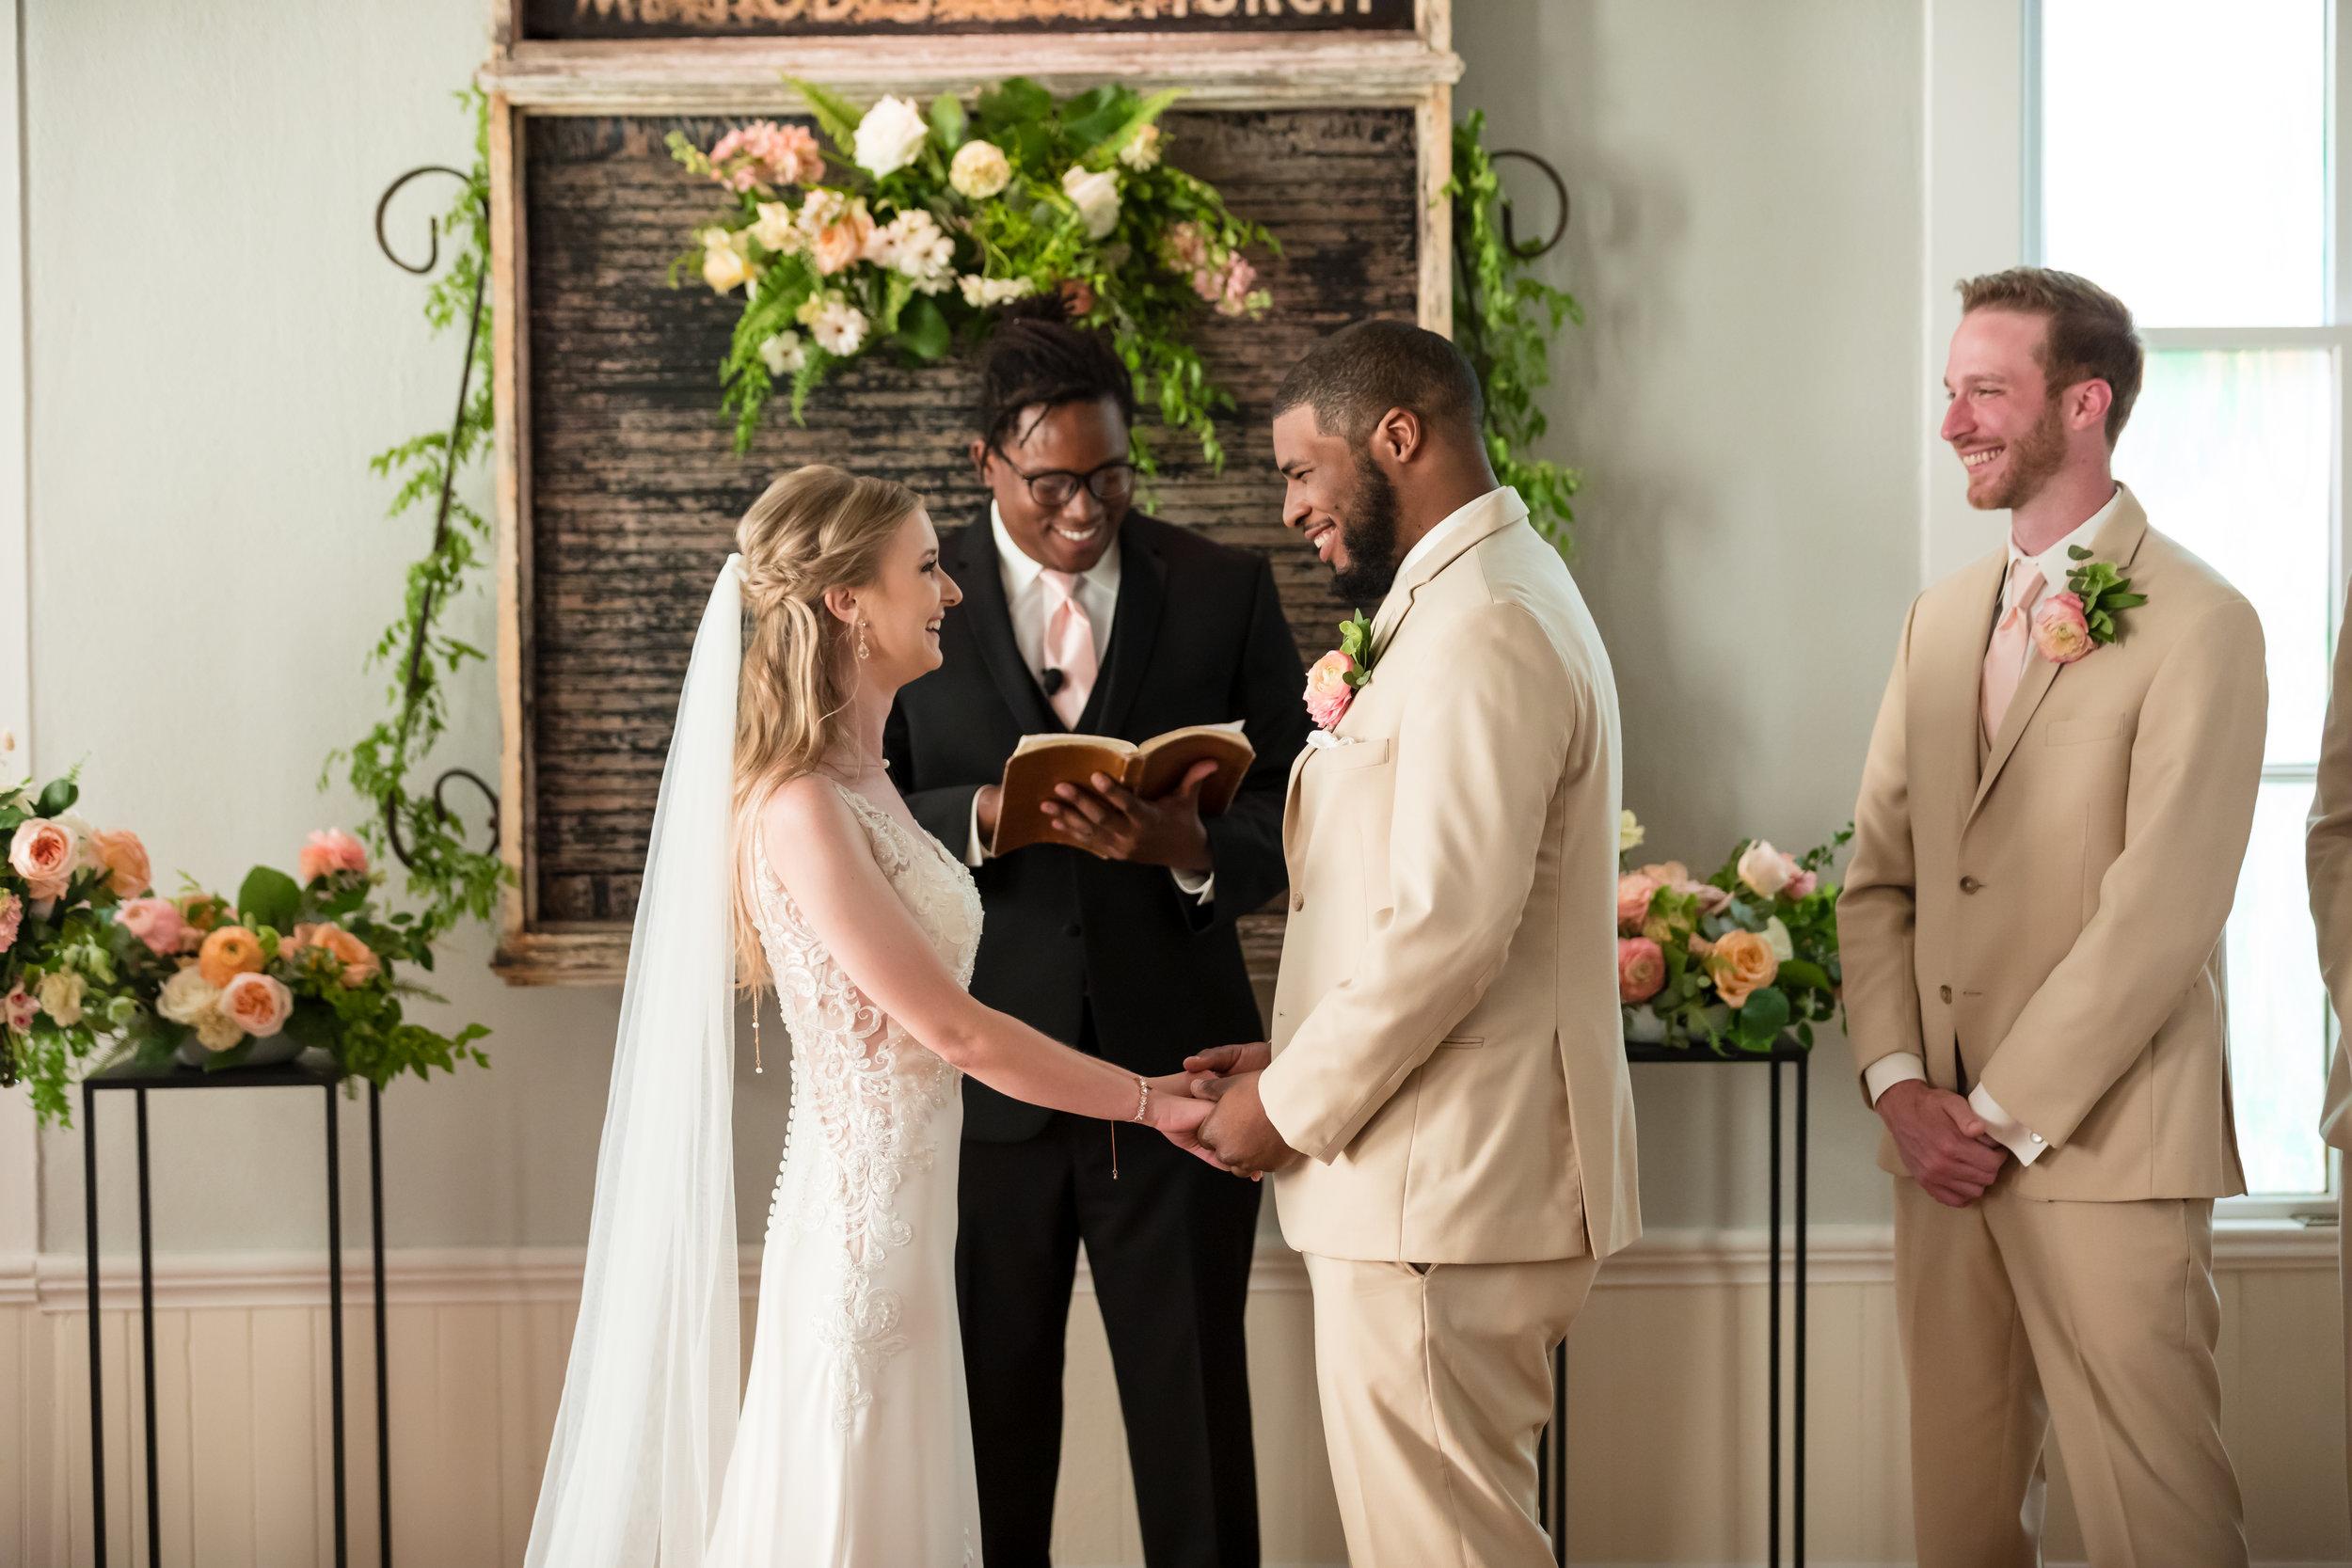 sarah_ikeem_wedding_at_the_parlour_at_manns_chapel_05.18.19-0508-2.jpg